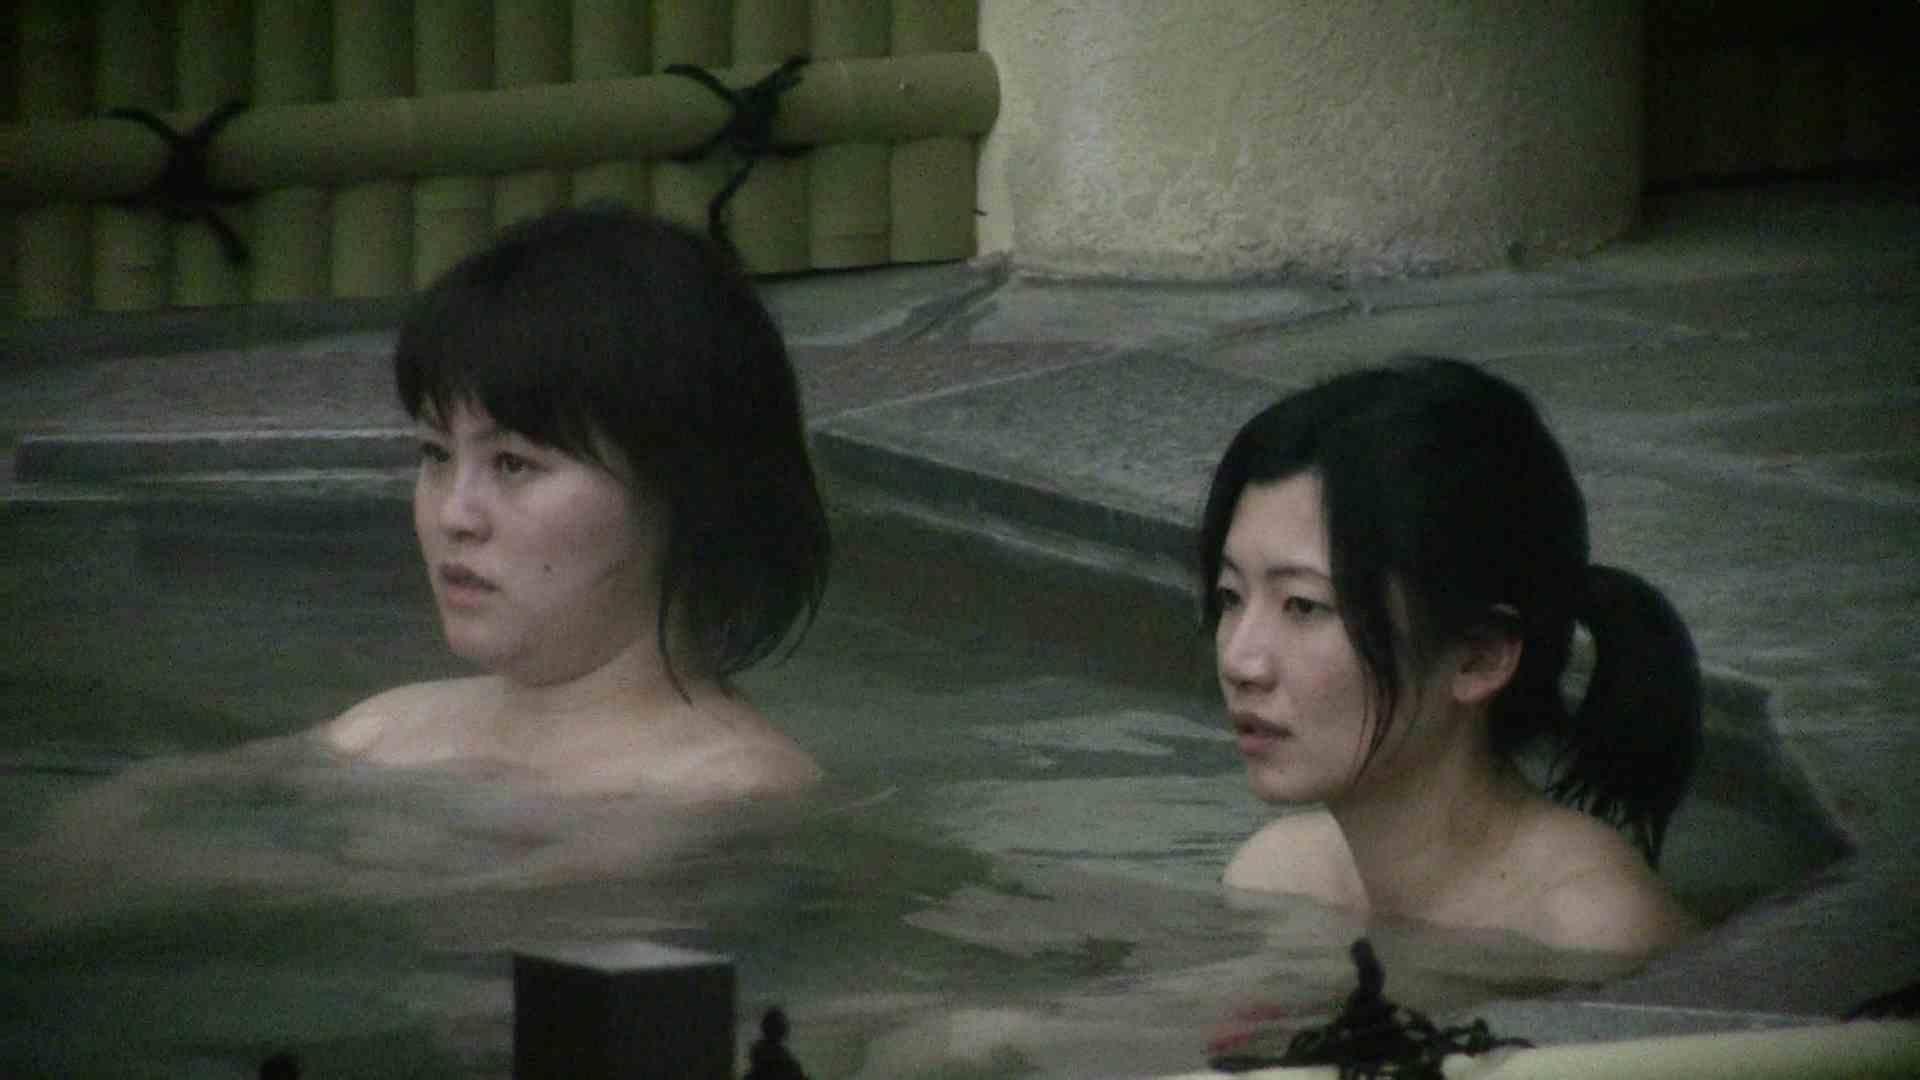 Aquaな露天風呂Vol.539 盗撮 エロ画像 50枚 8